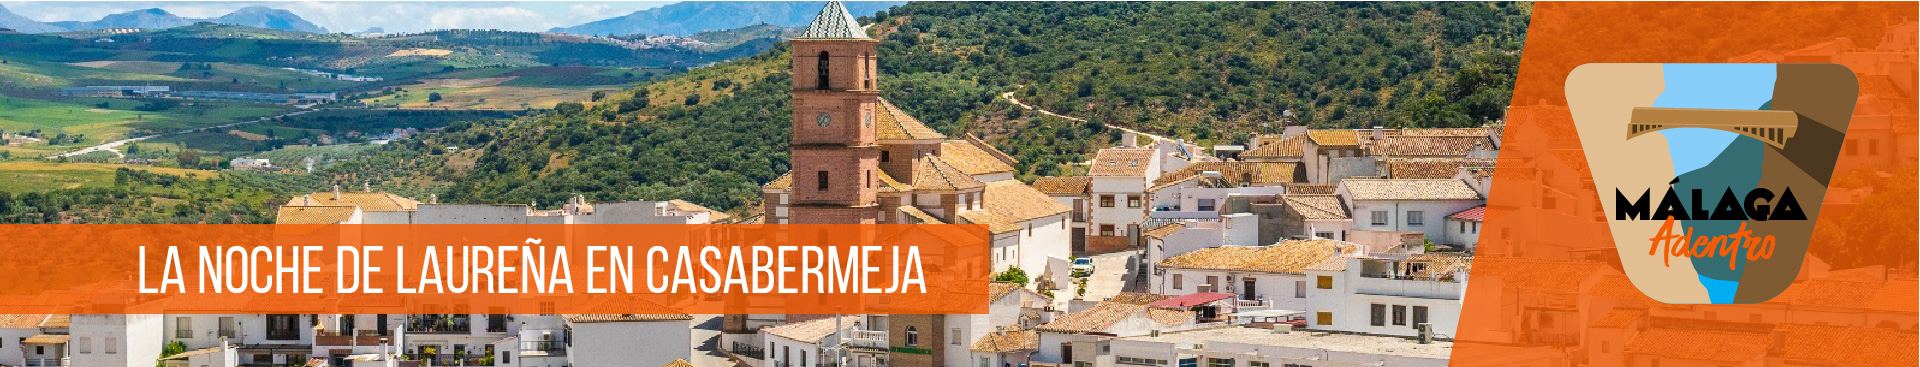 Malaga Adentro- Casabermeja